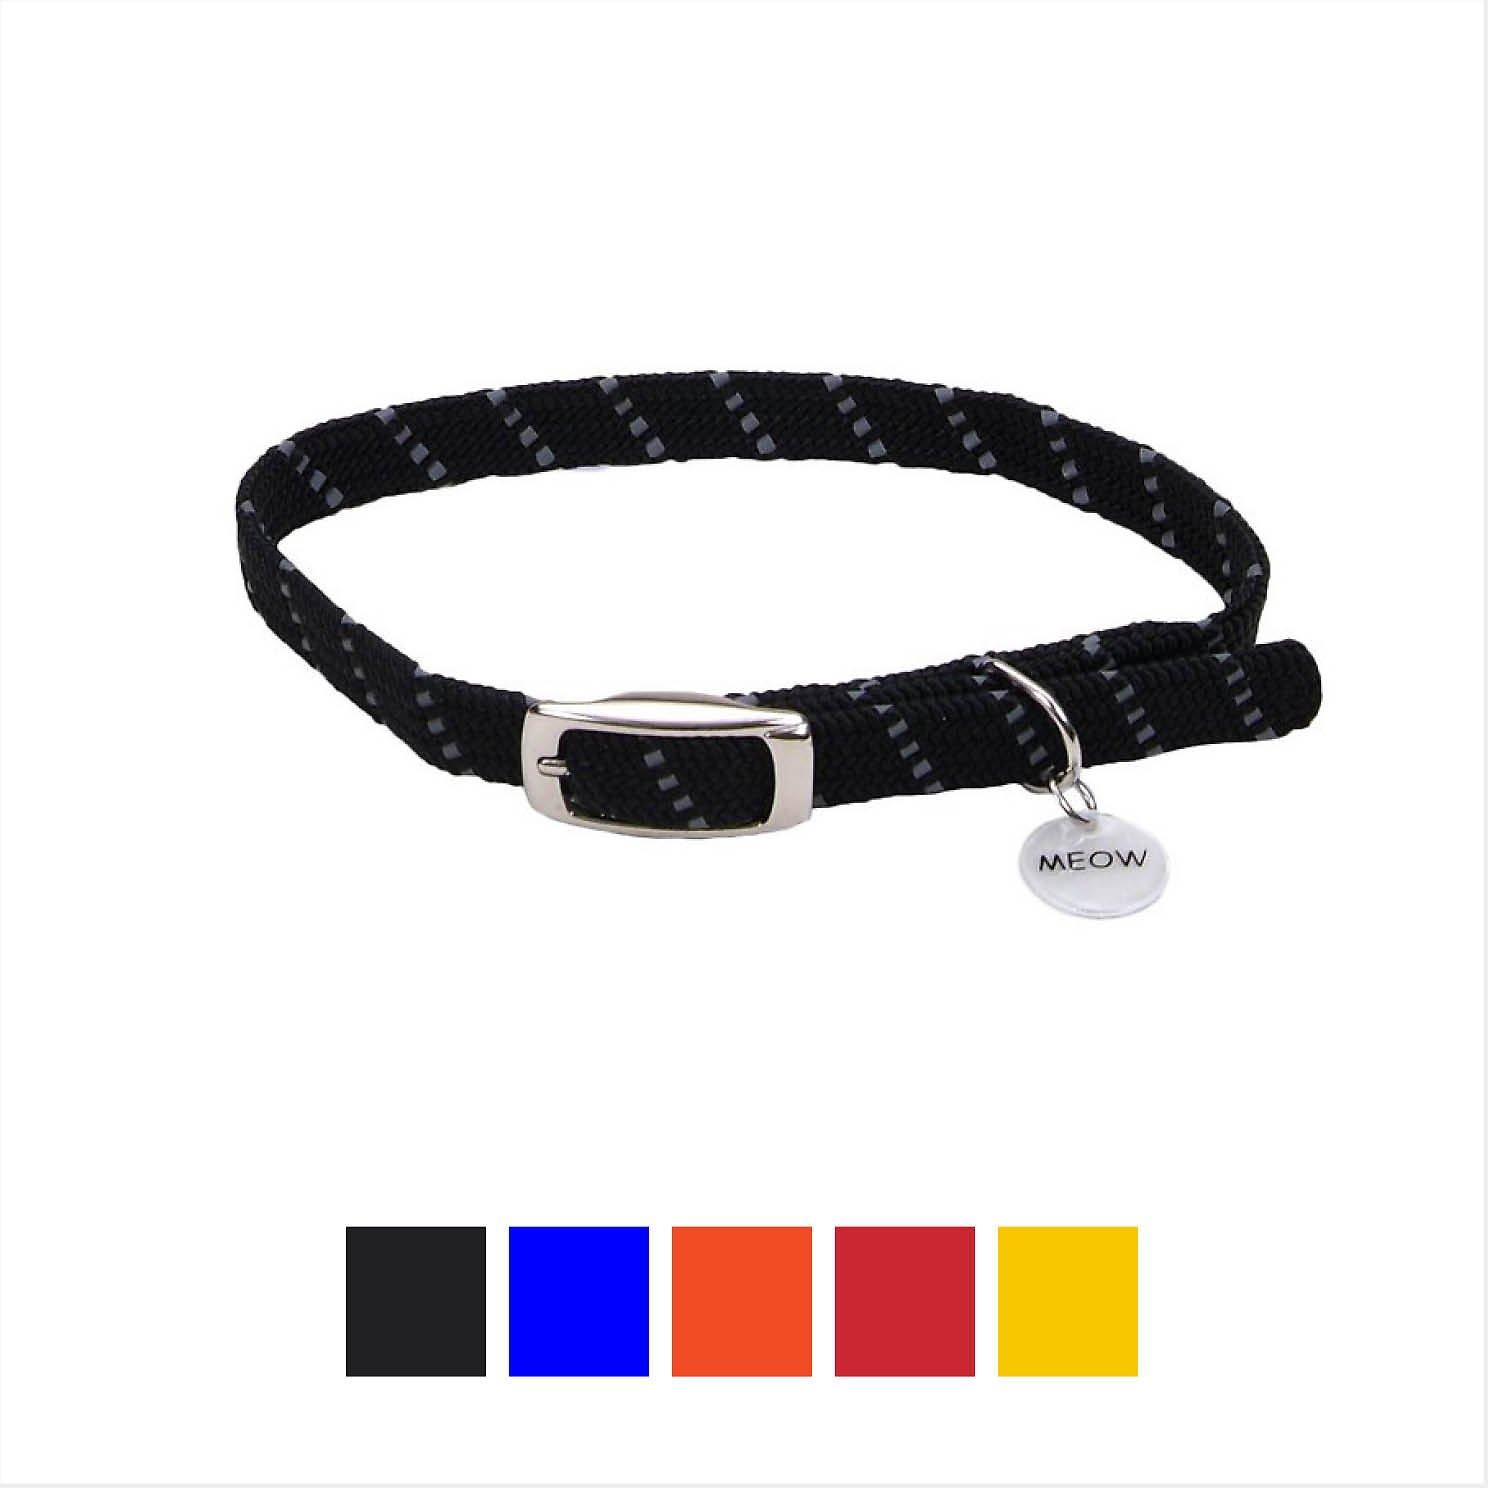 ElastaCat Reflective Safety Stretch Cat Collar, Black, 10-in